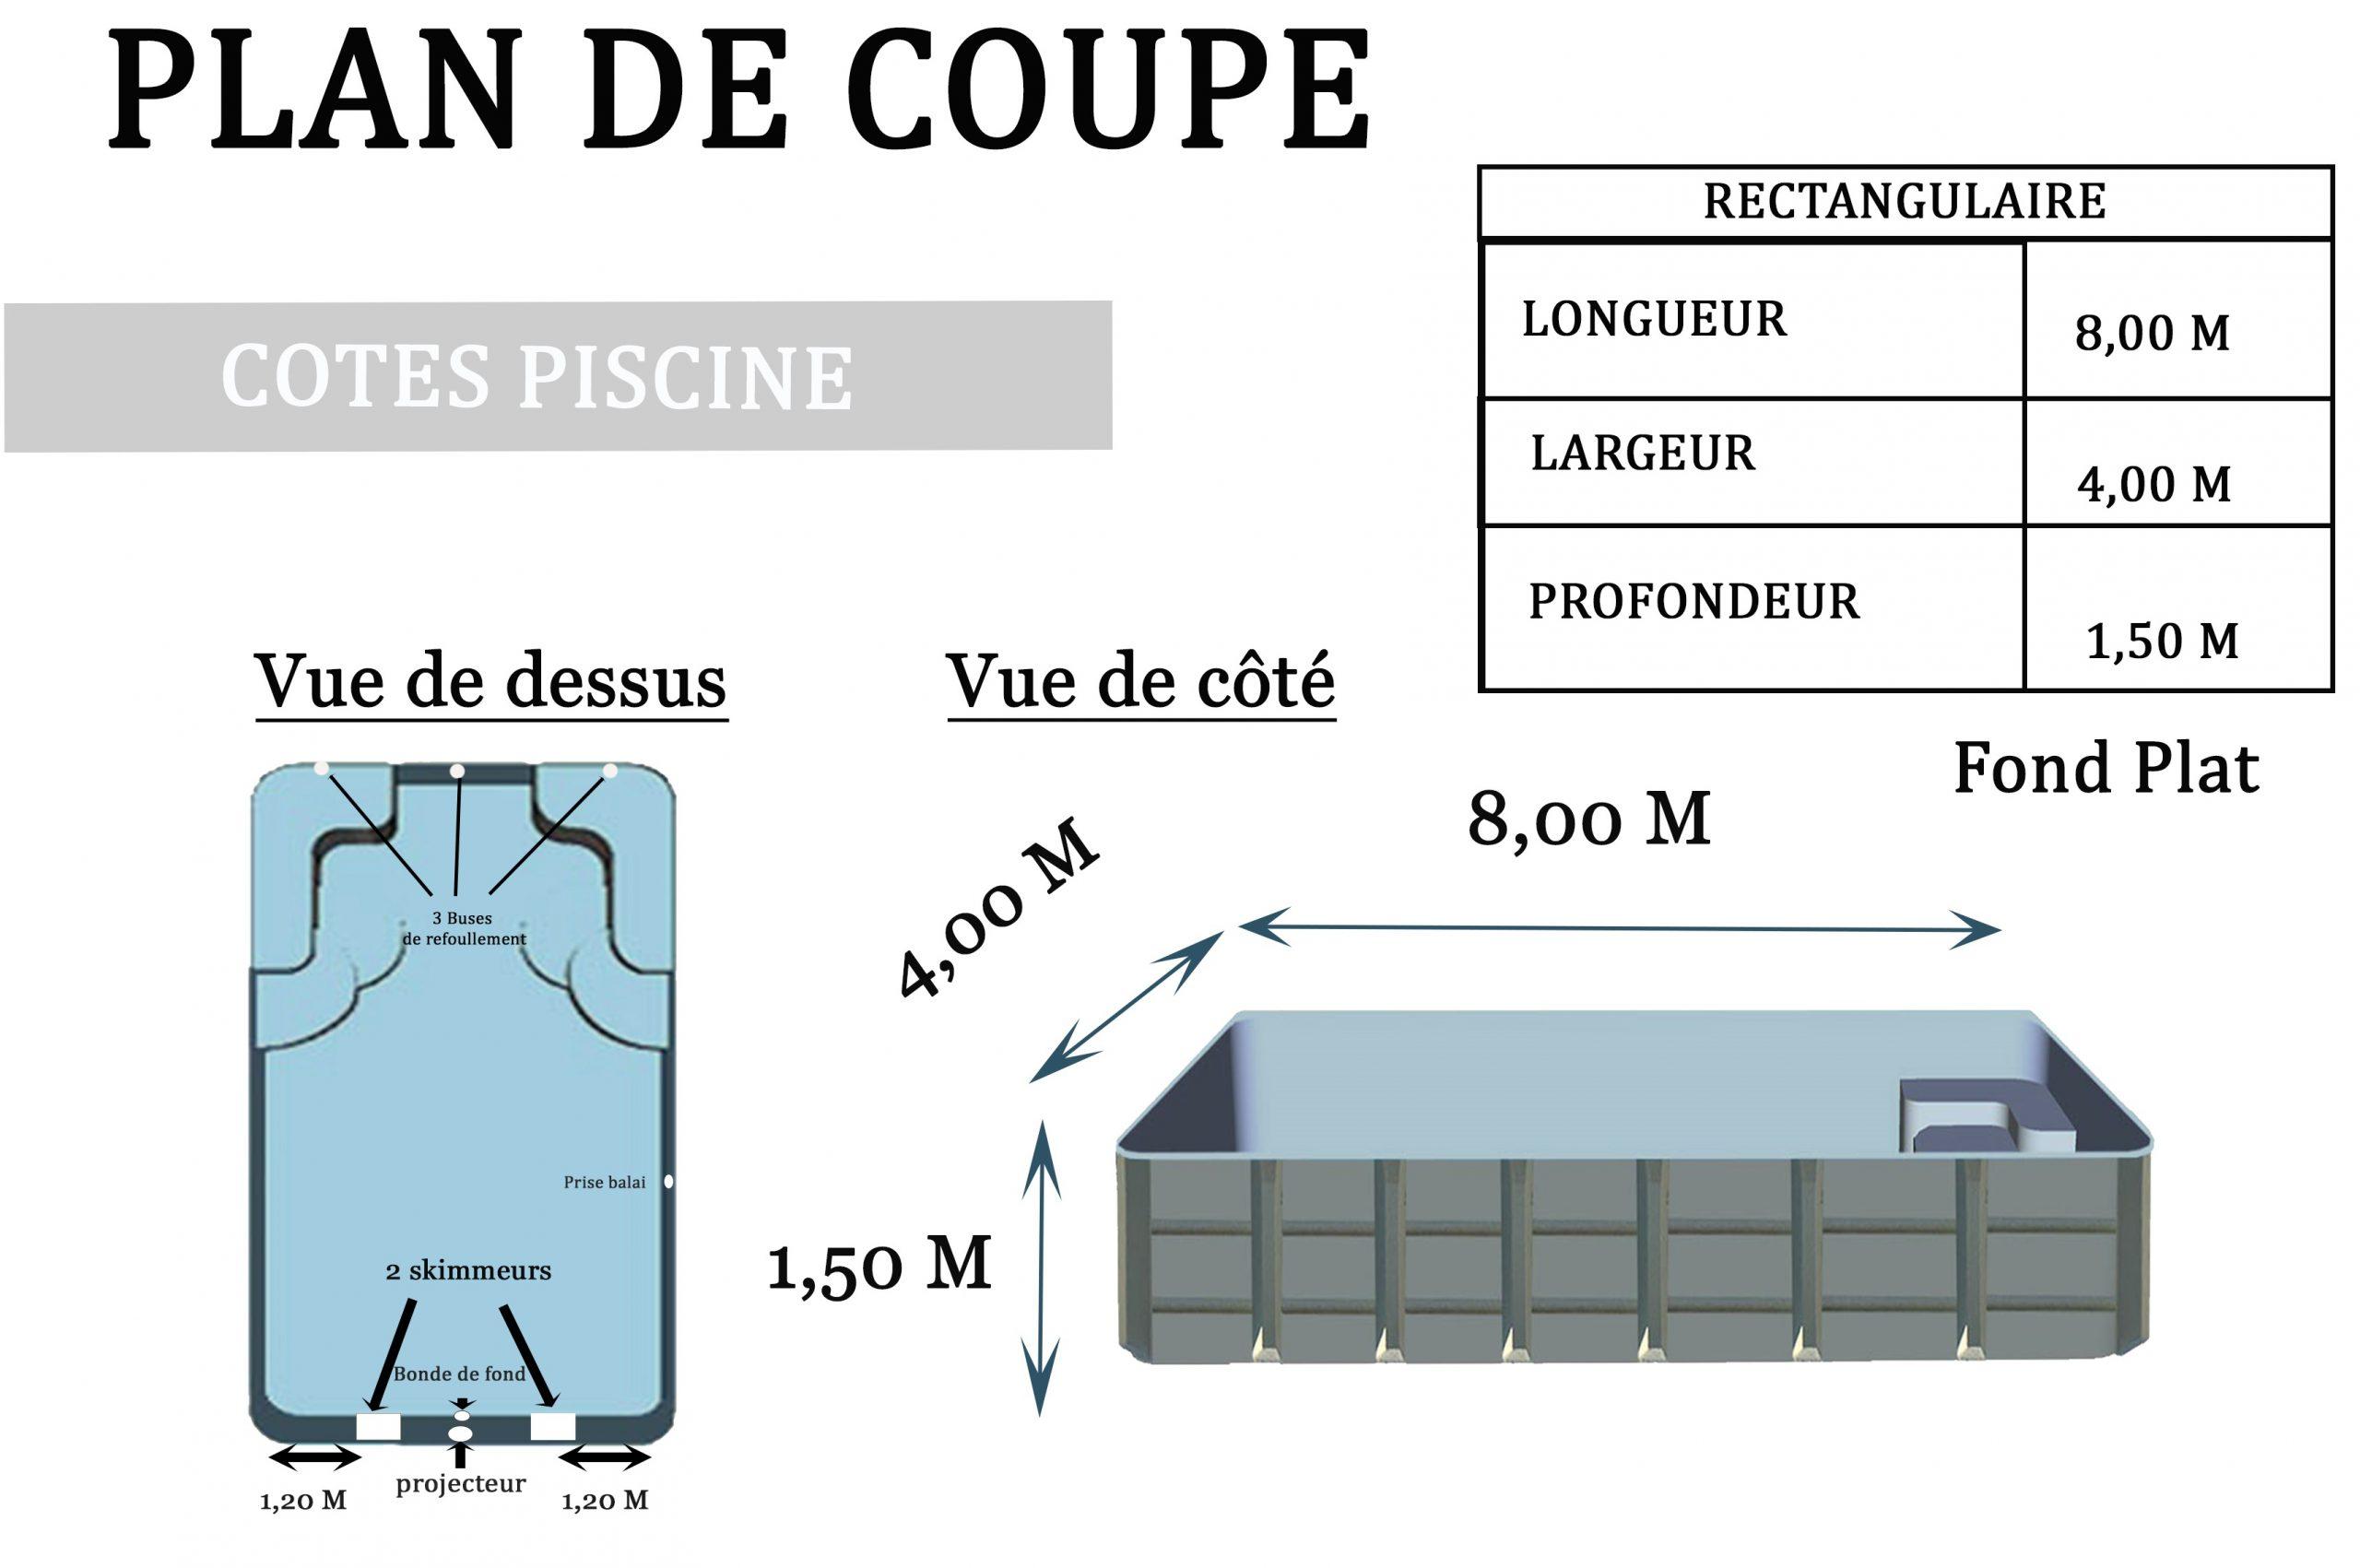 Piscine Coque Polyester Okea Rectangulaire 8M X 4M intérieur Piscine Discount Firminy